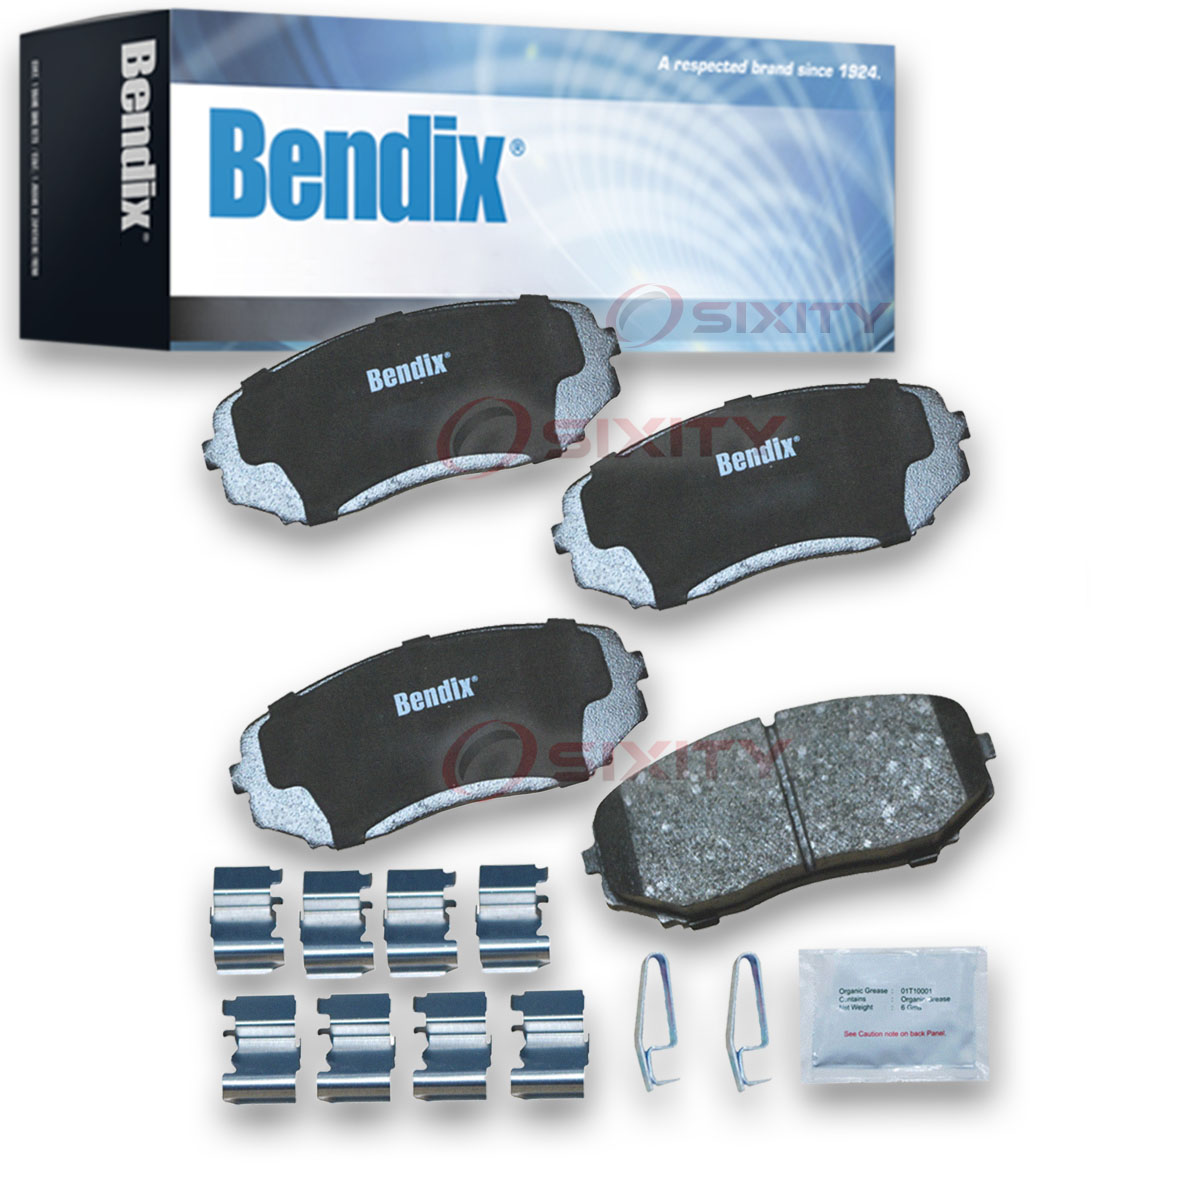 with Installation Hardware Rear Bendix Premium Copper Free CFC536 Premium Copper Free Ceramic Brake Pad